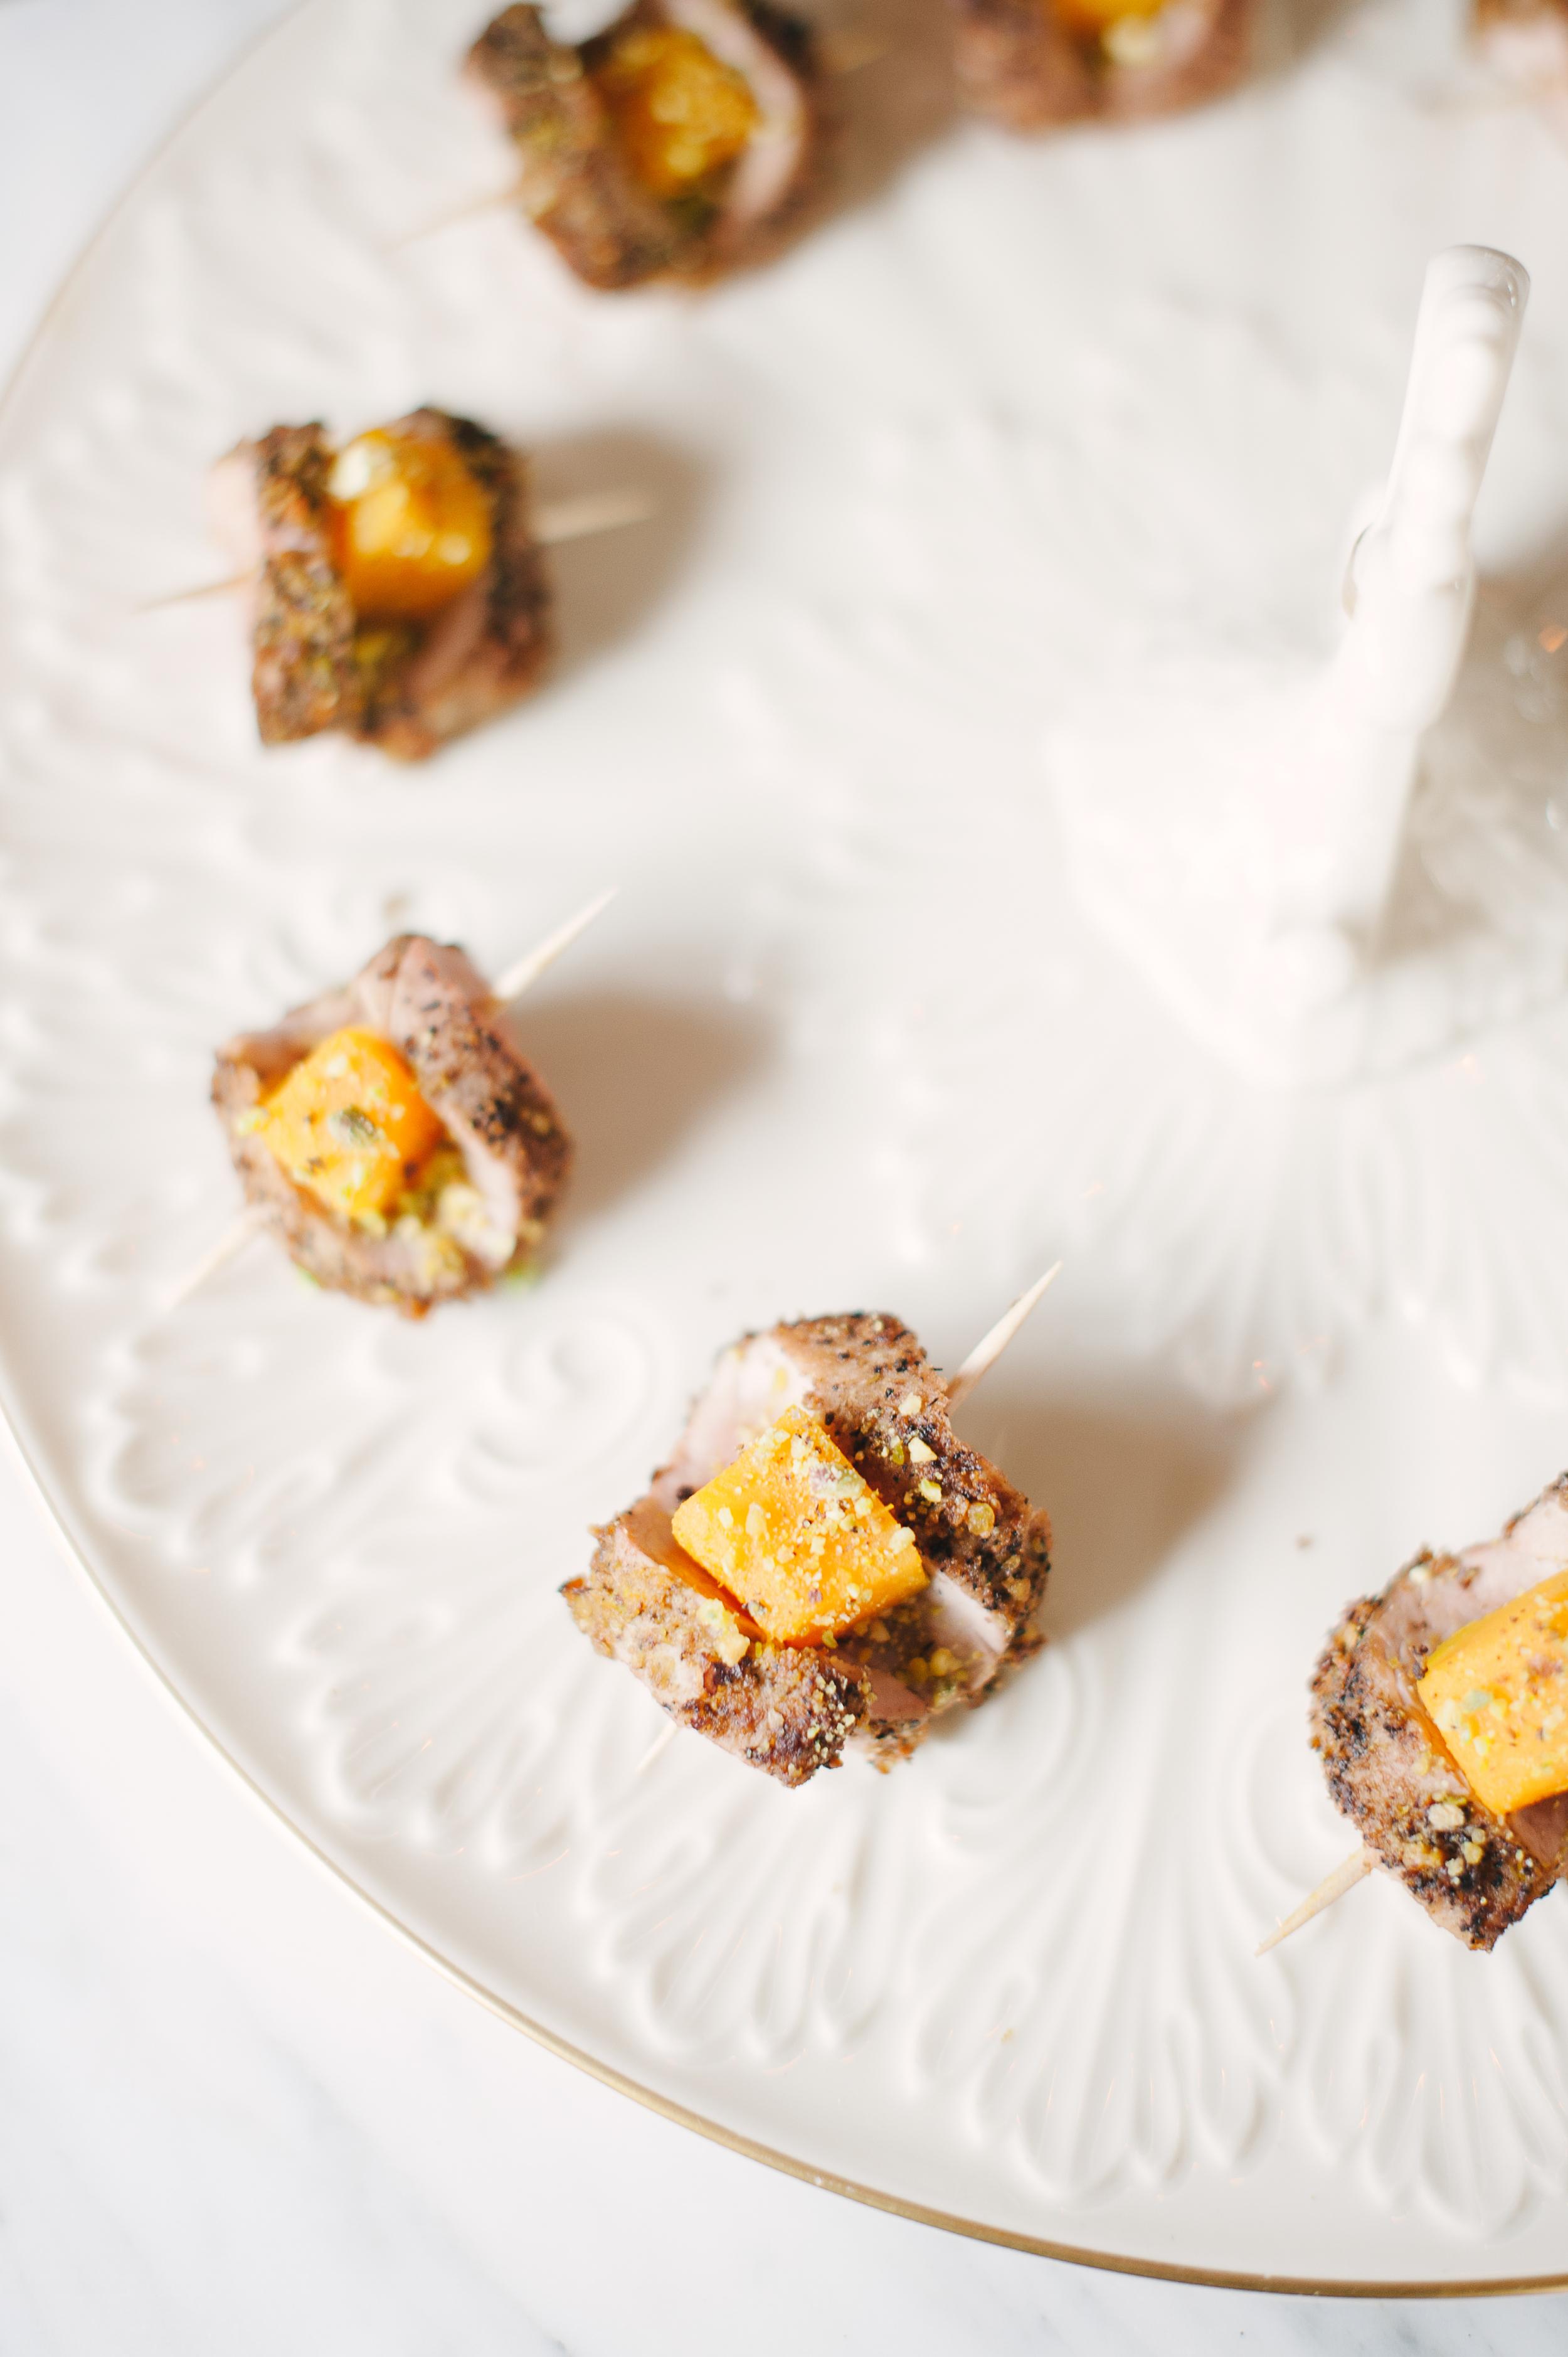 Pork Tenderloin with Honey Orange and Butternut Squash